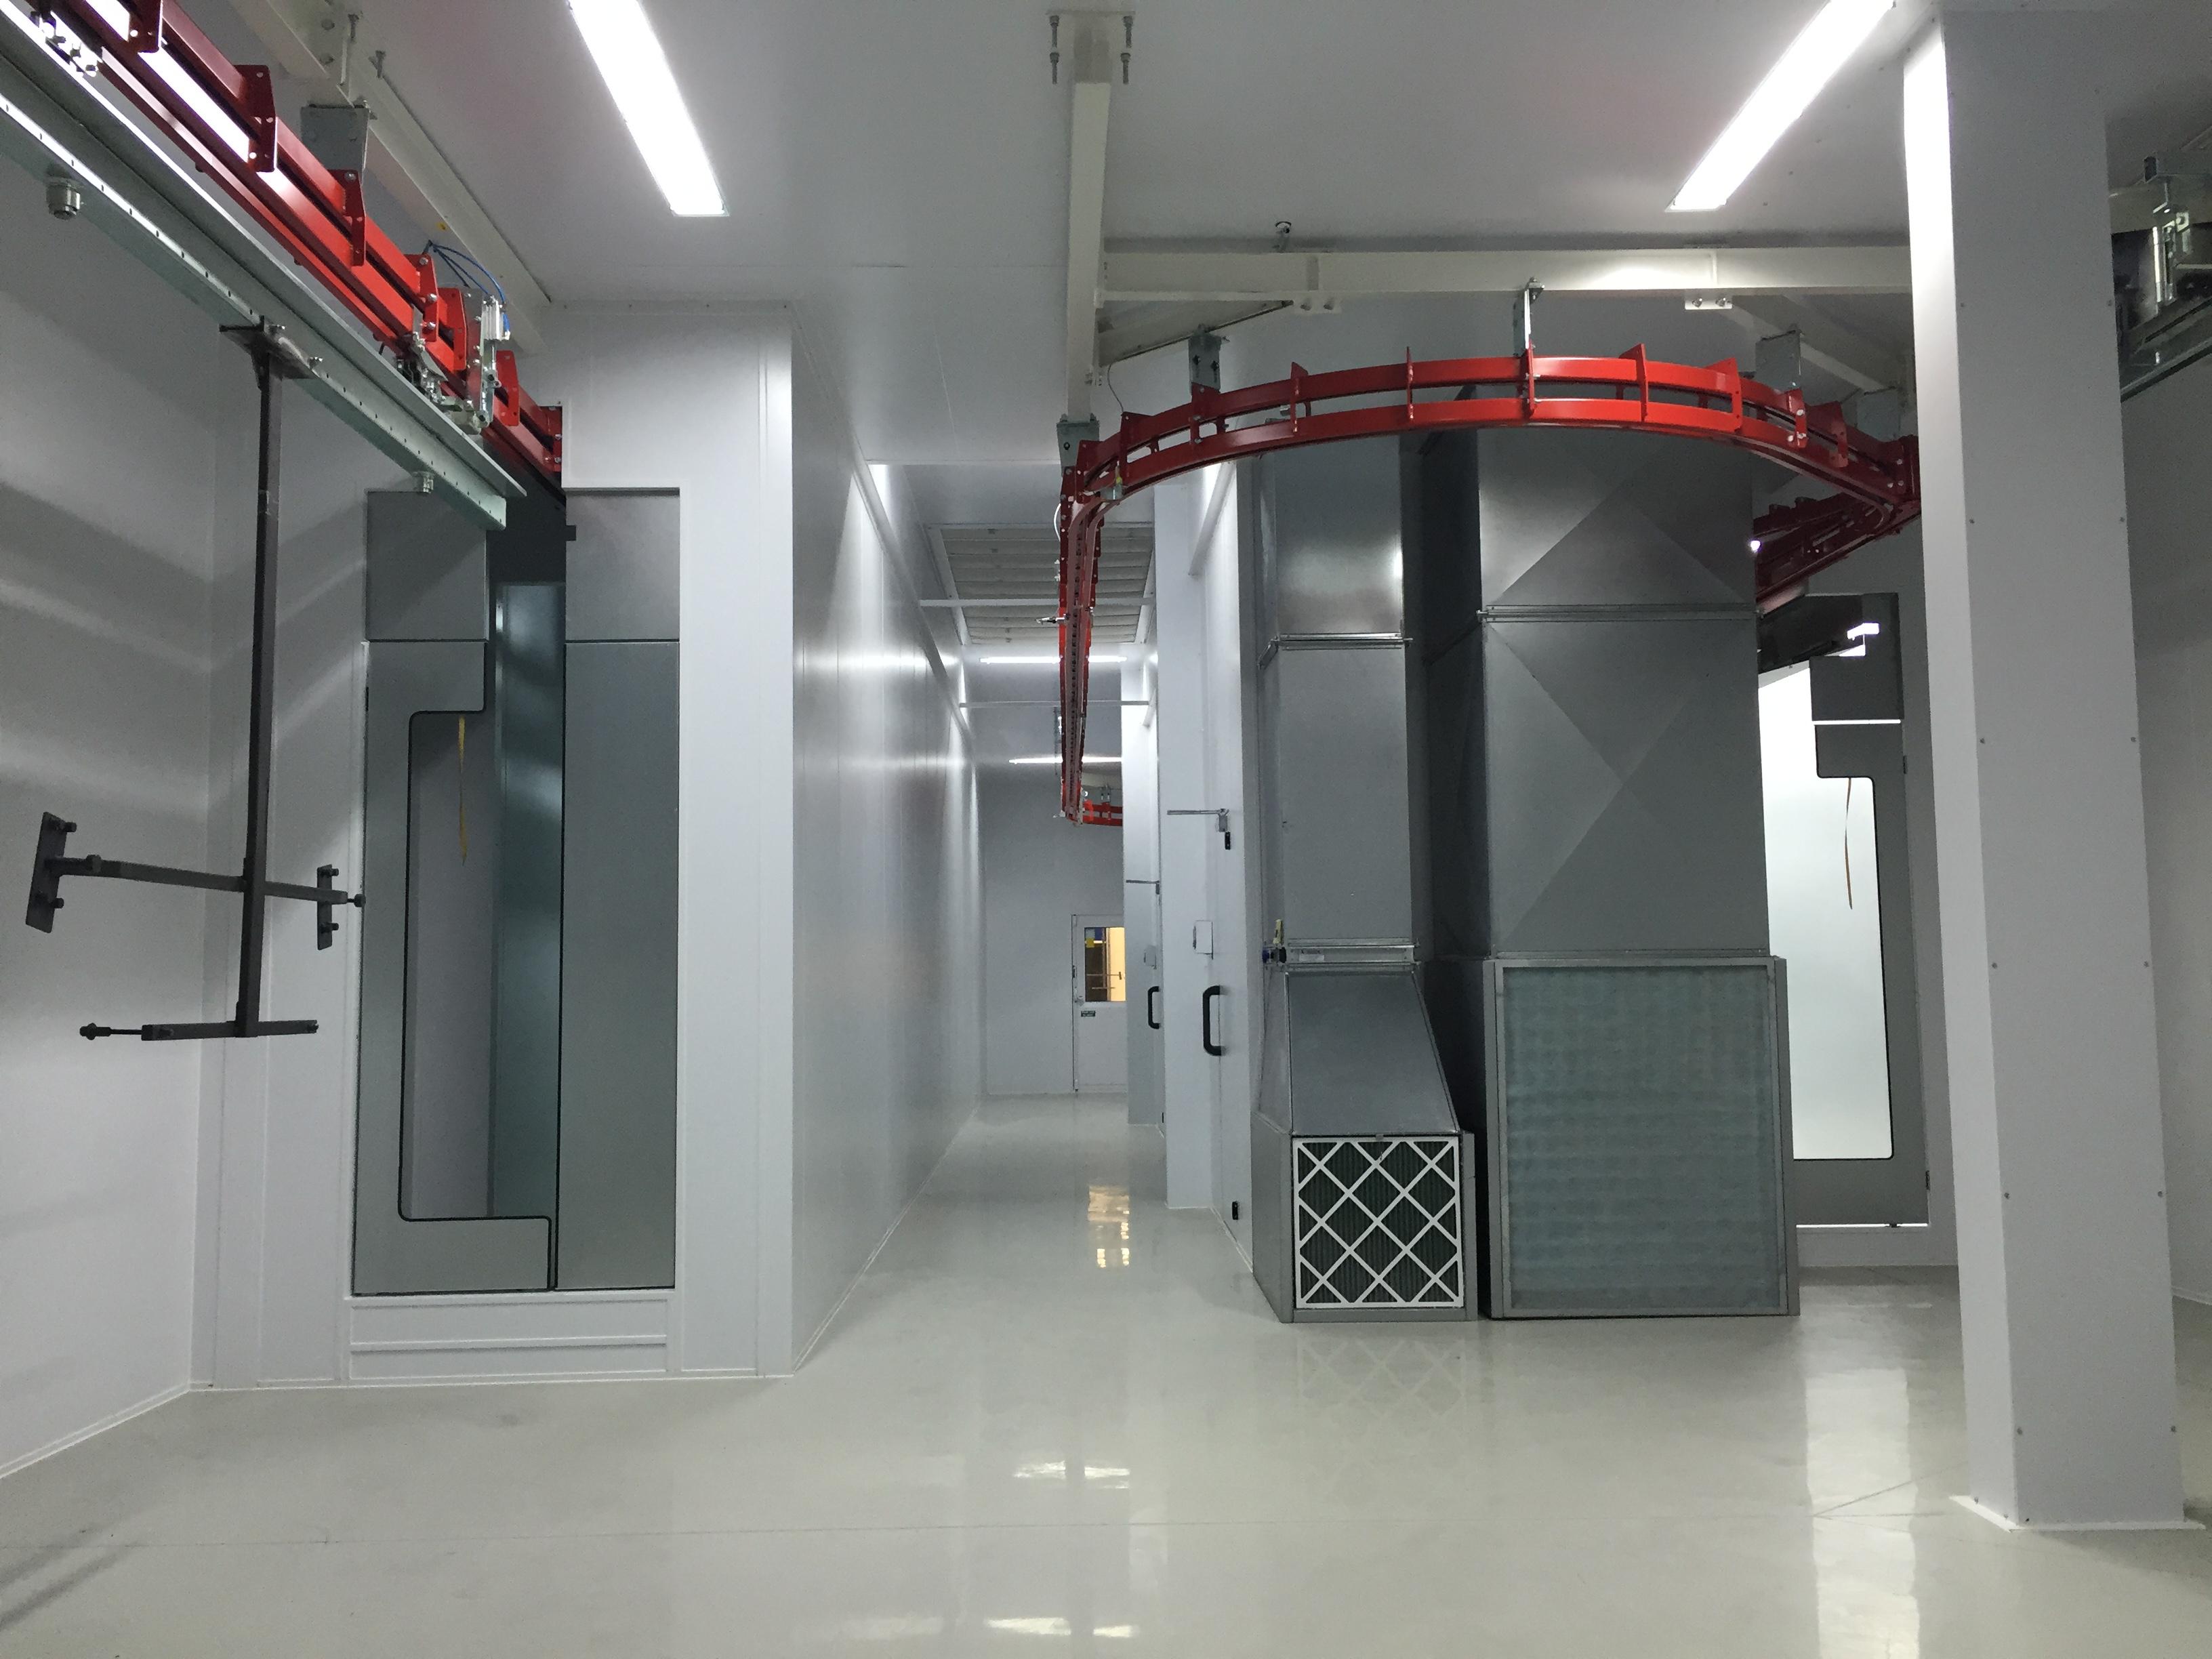 Floor Amp Overhead Conveyor Systems For Industrial Applications